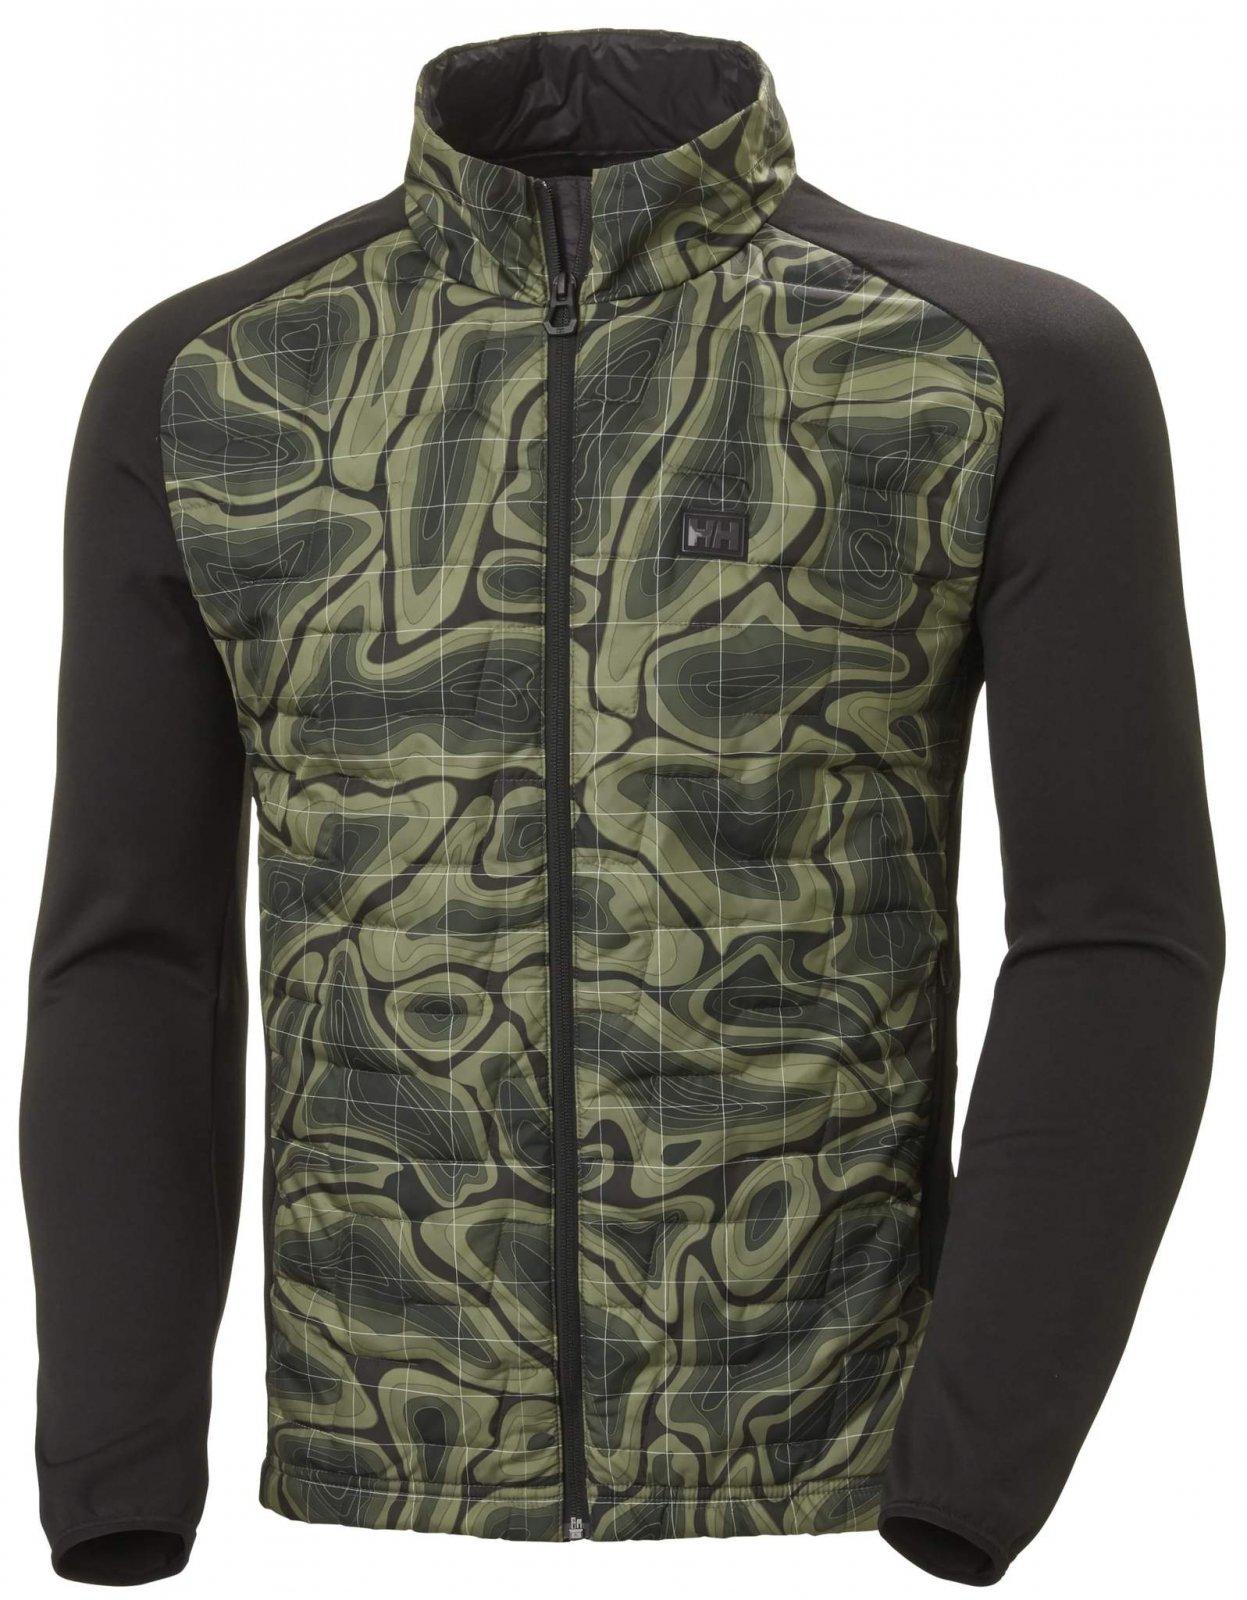 Helly Hansen M's Lifa Loft Insulator Jacket